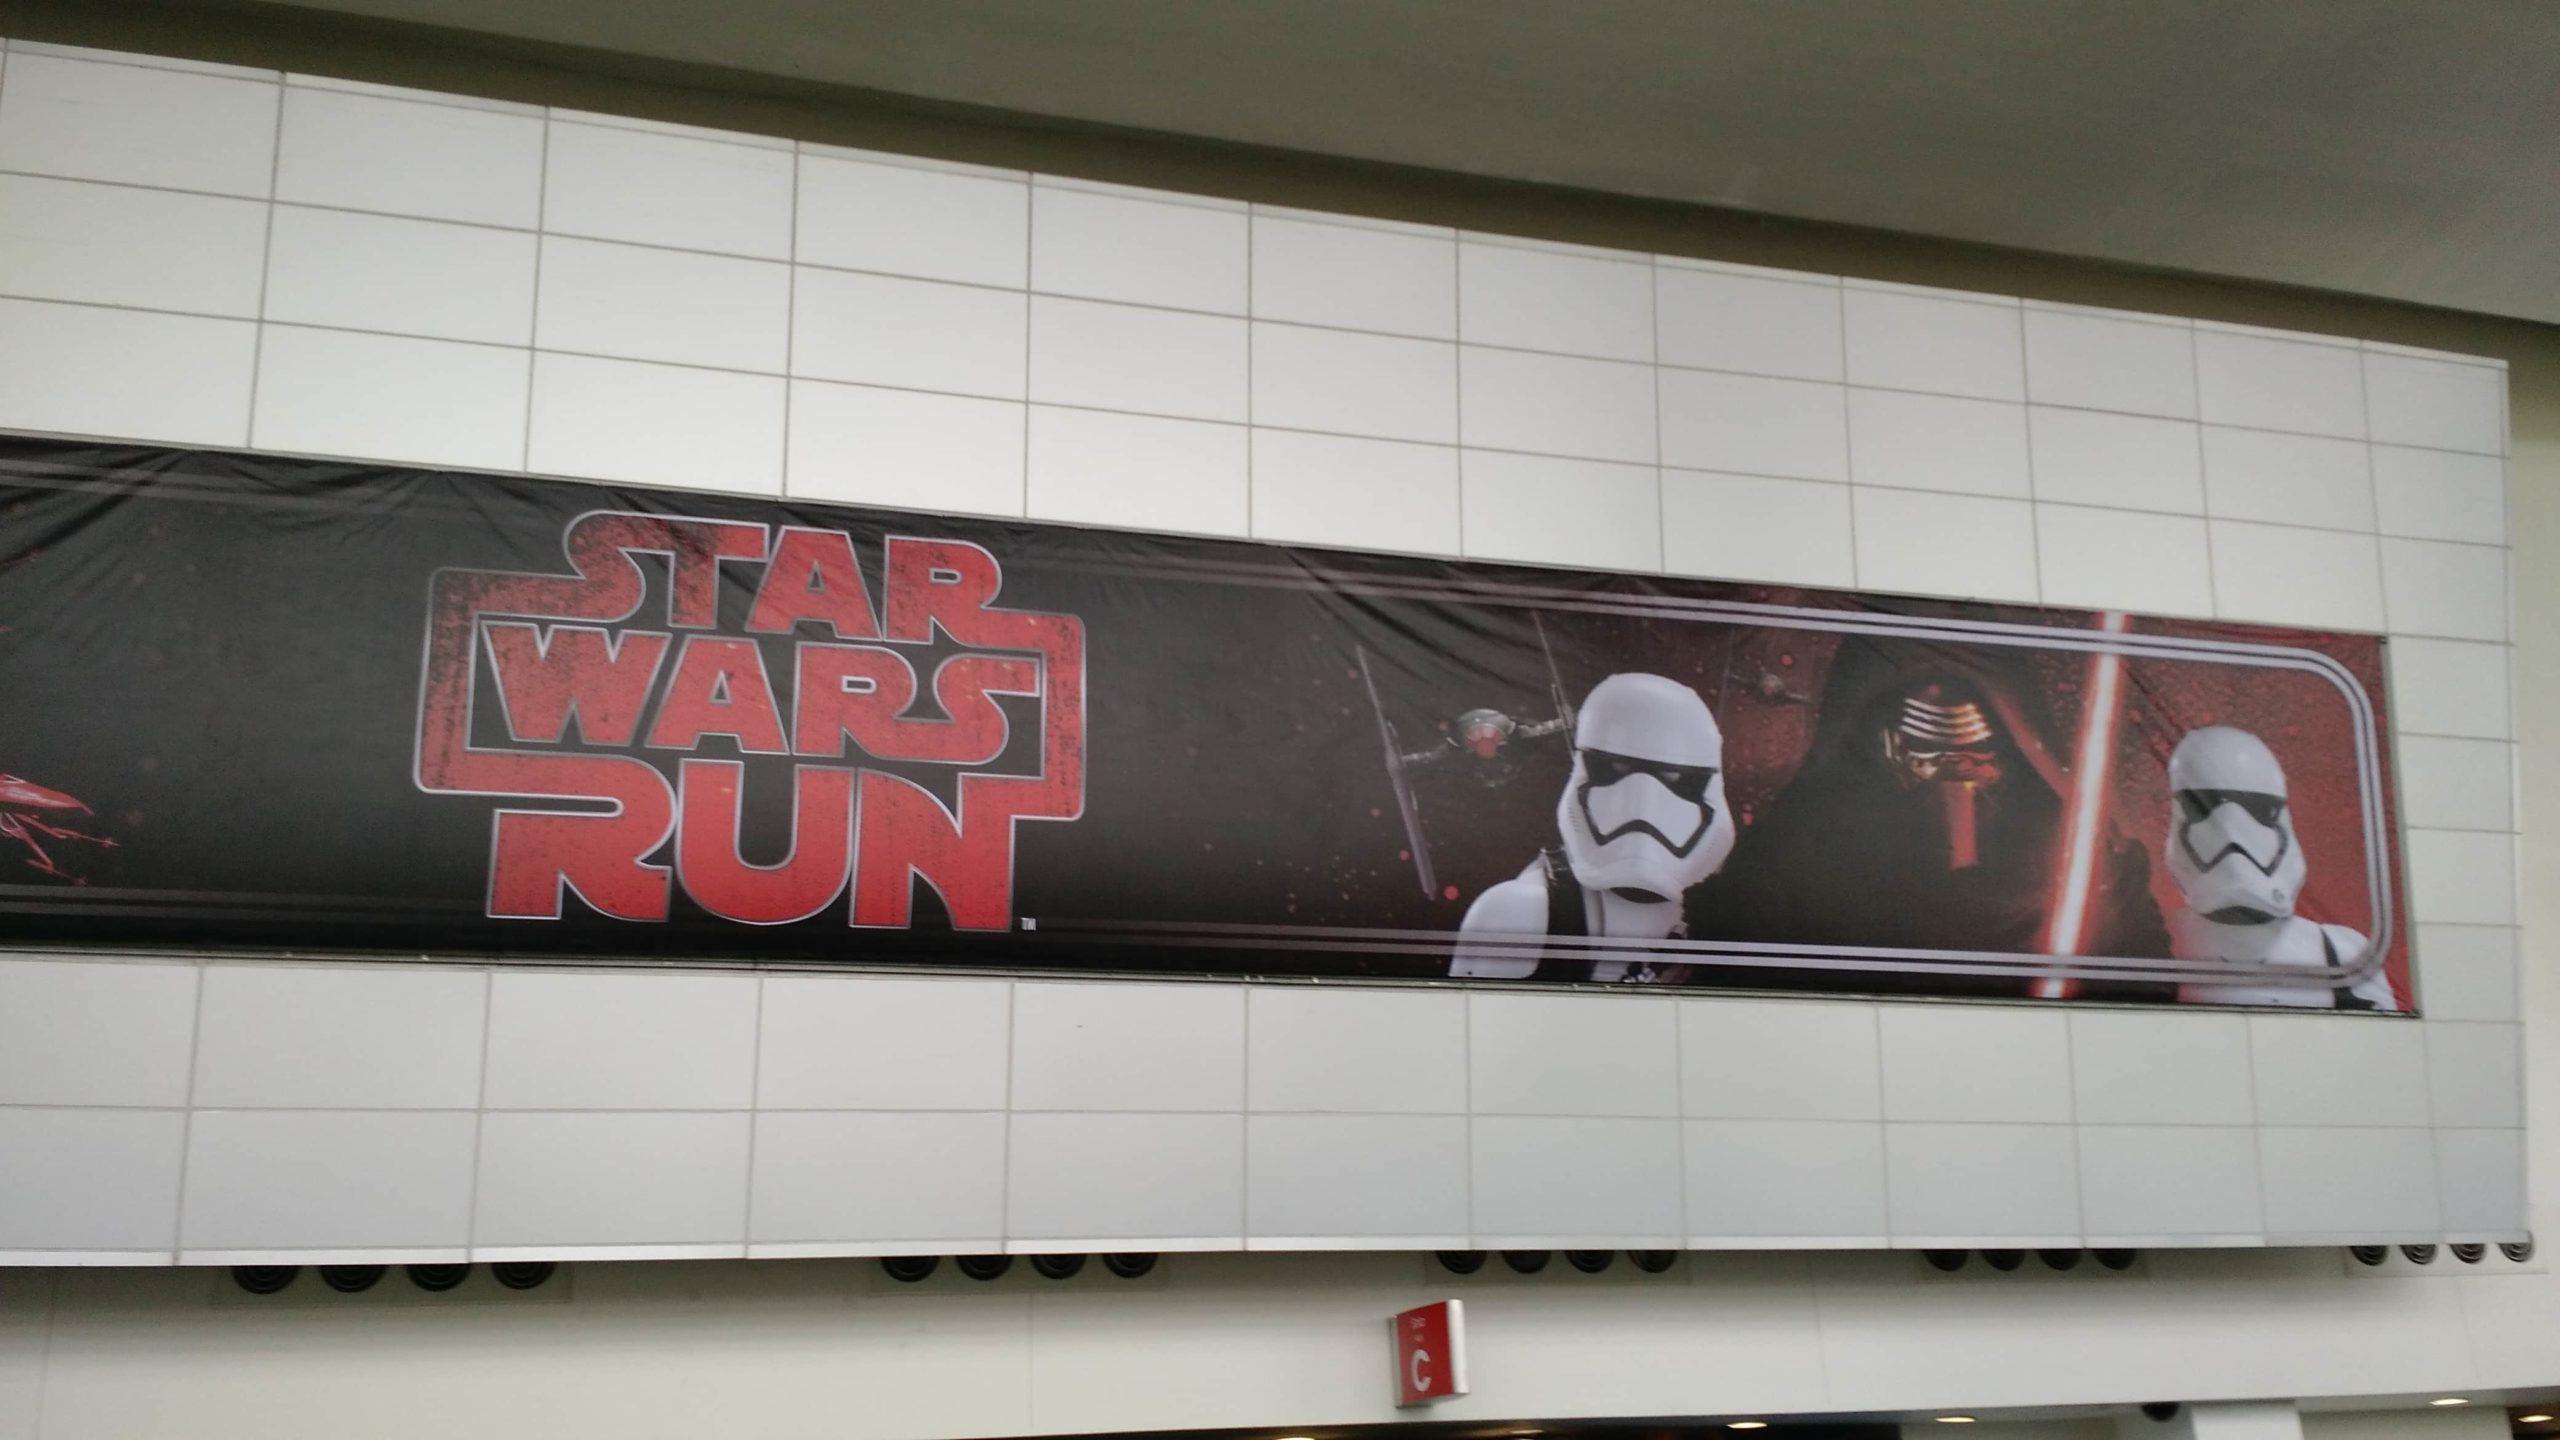 Star Wars on the Run